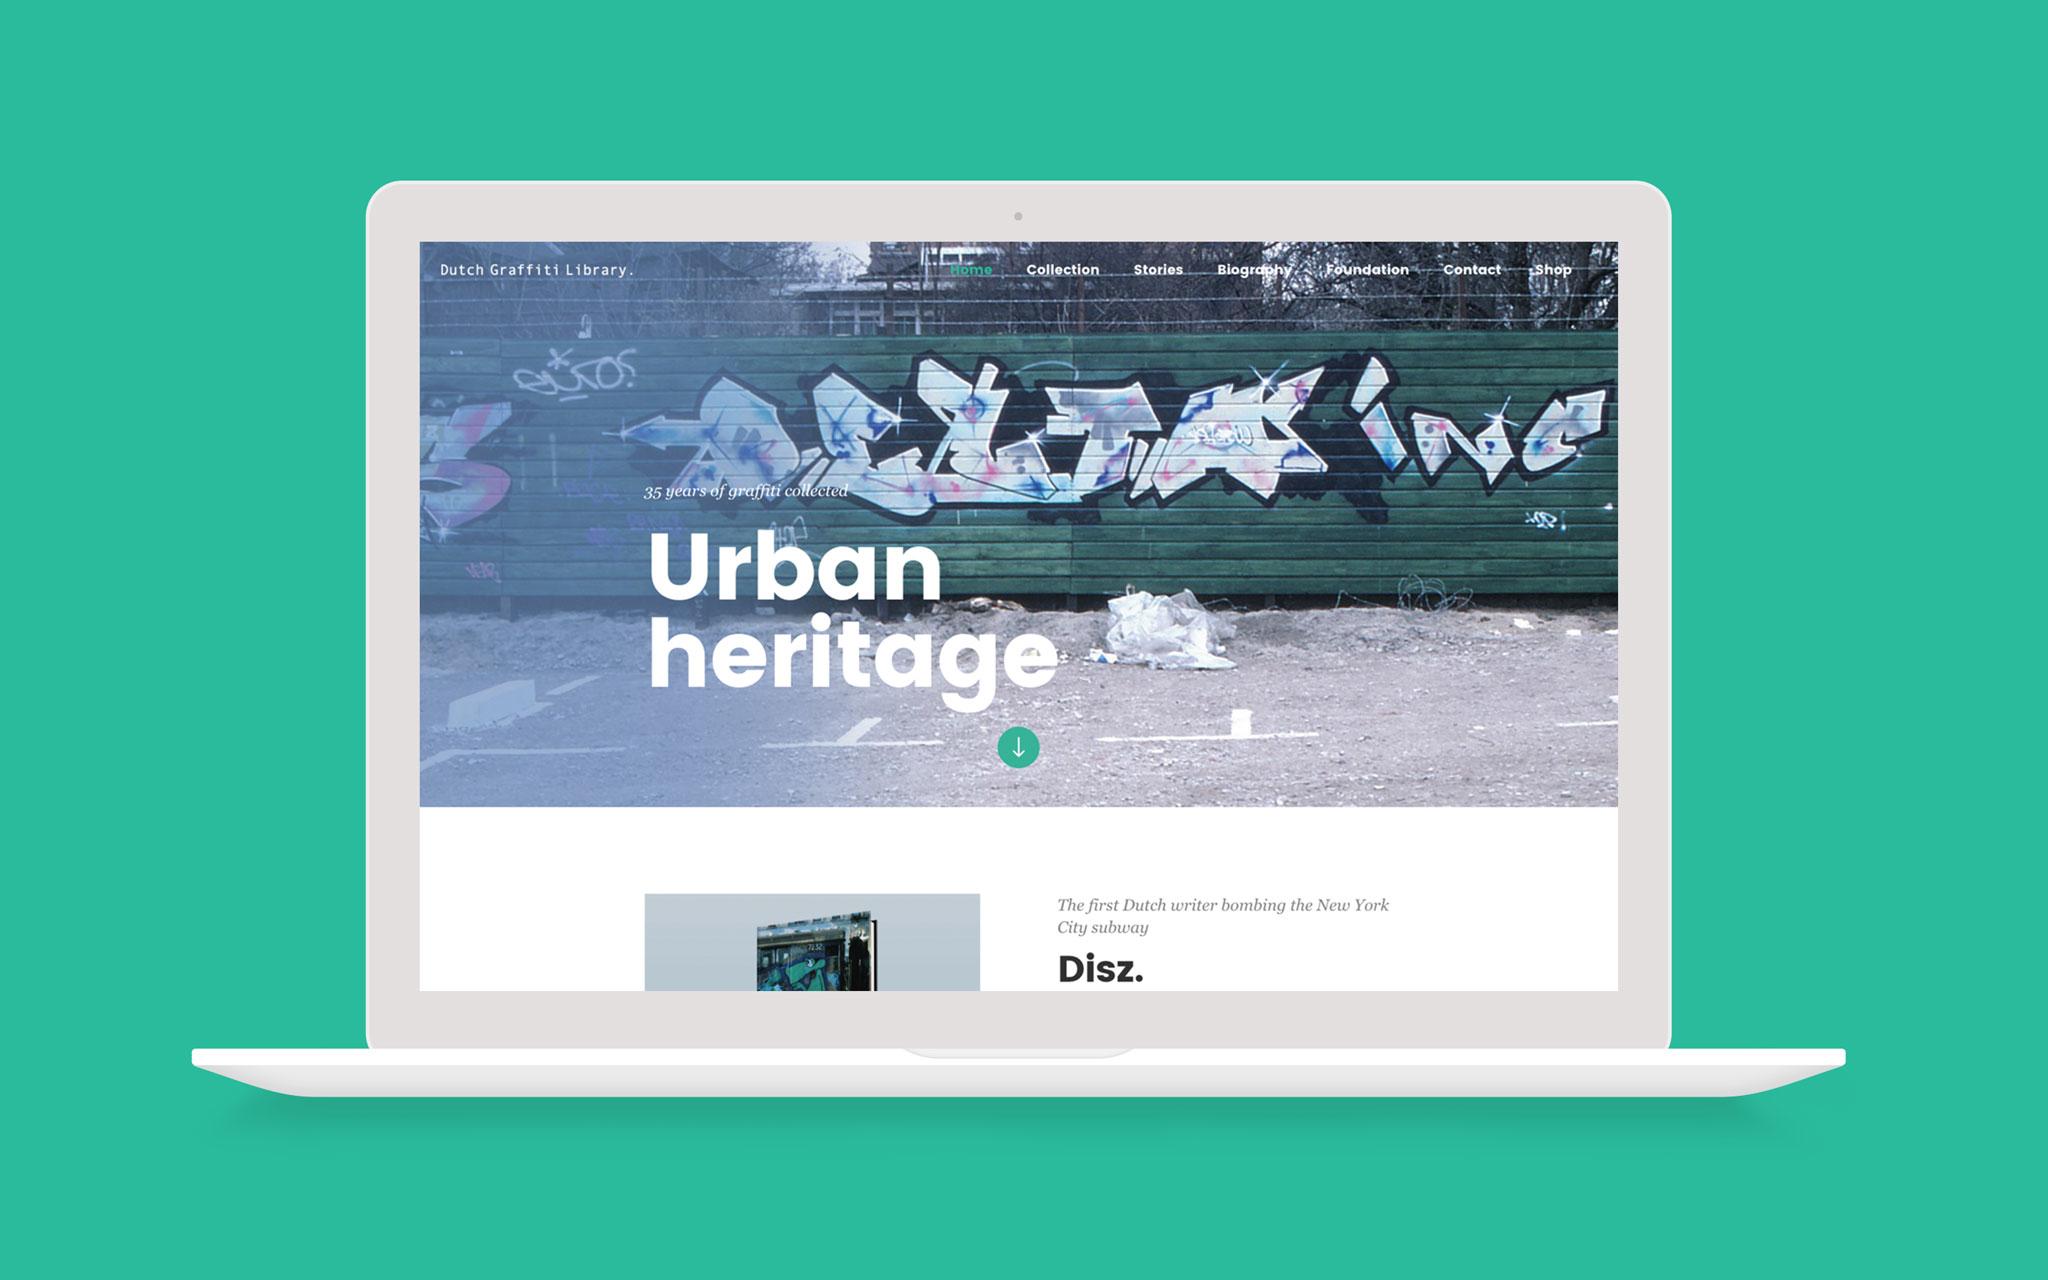 Dutch Graffiti Library website in laptop mockup groene achtergrond